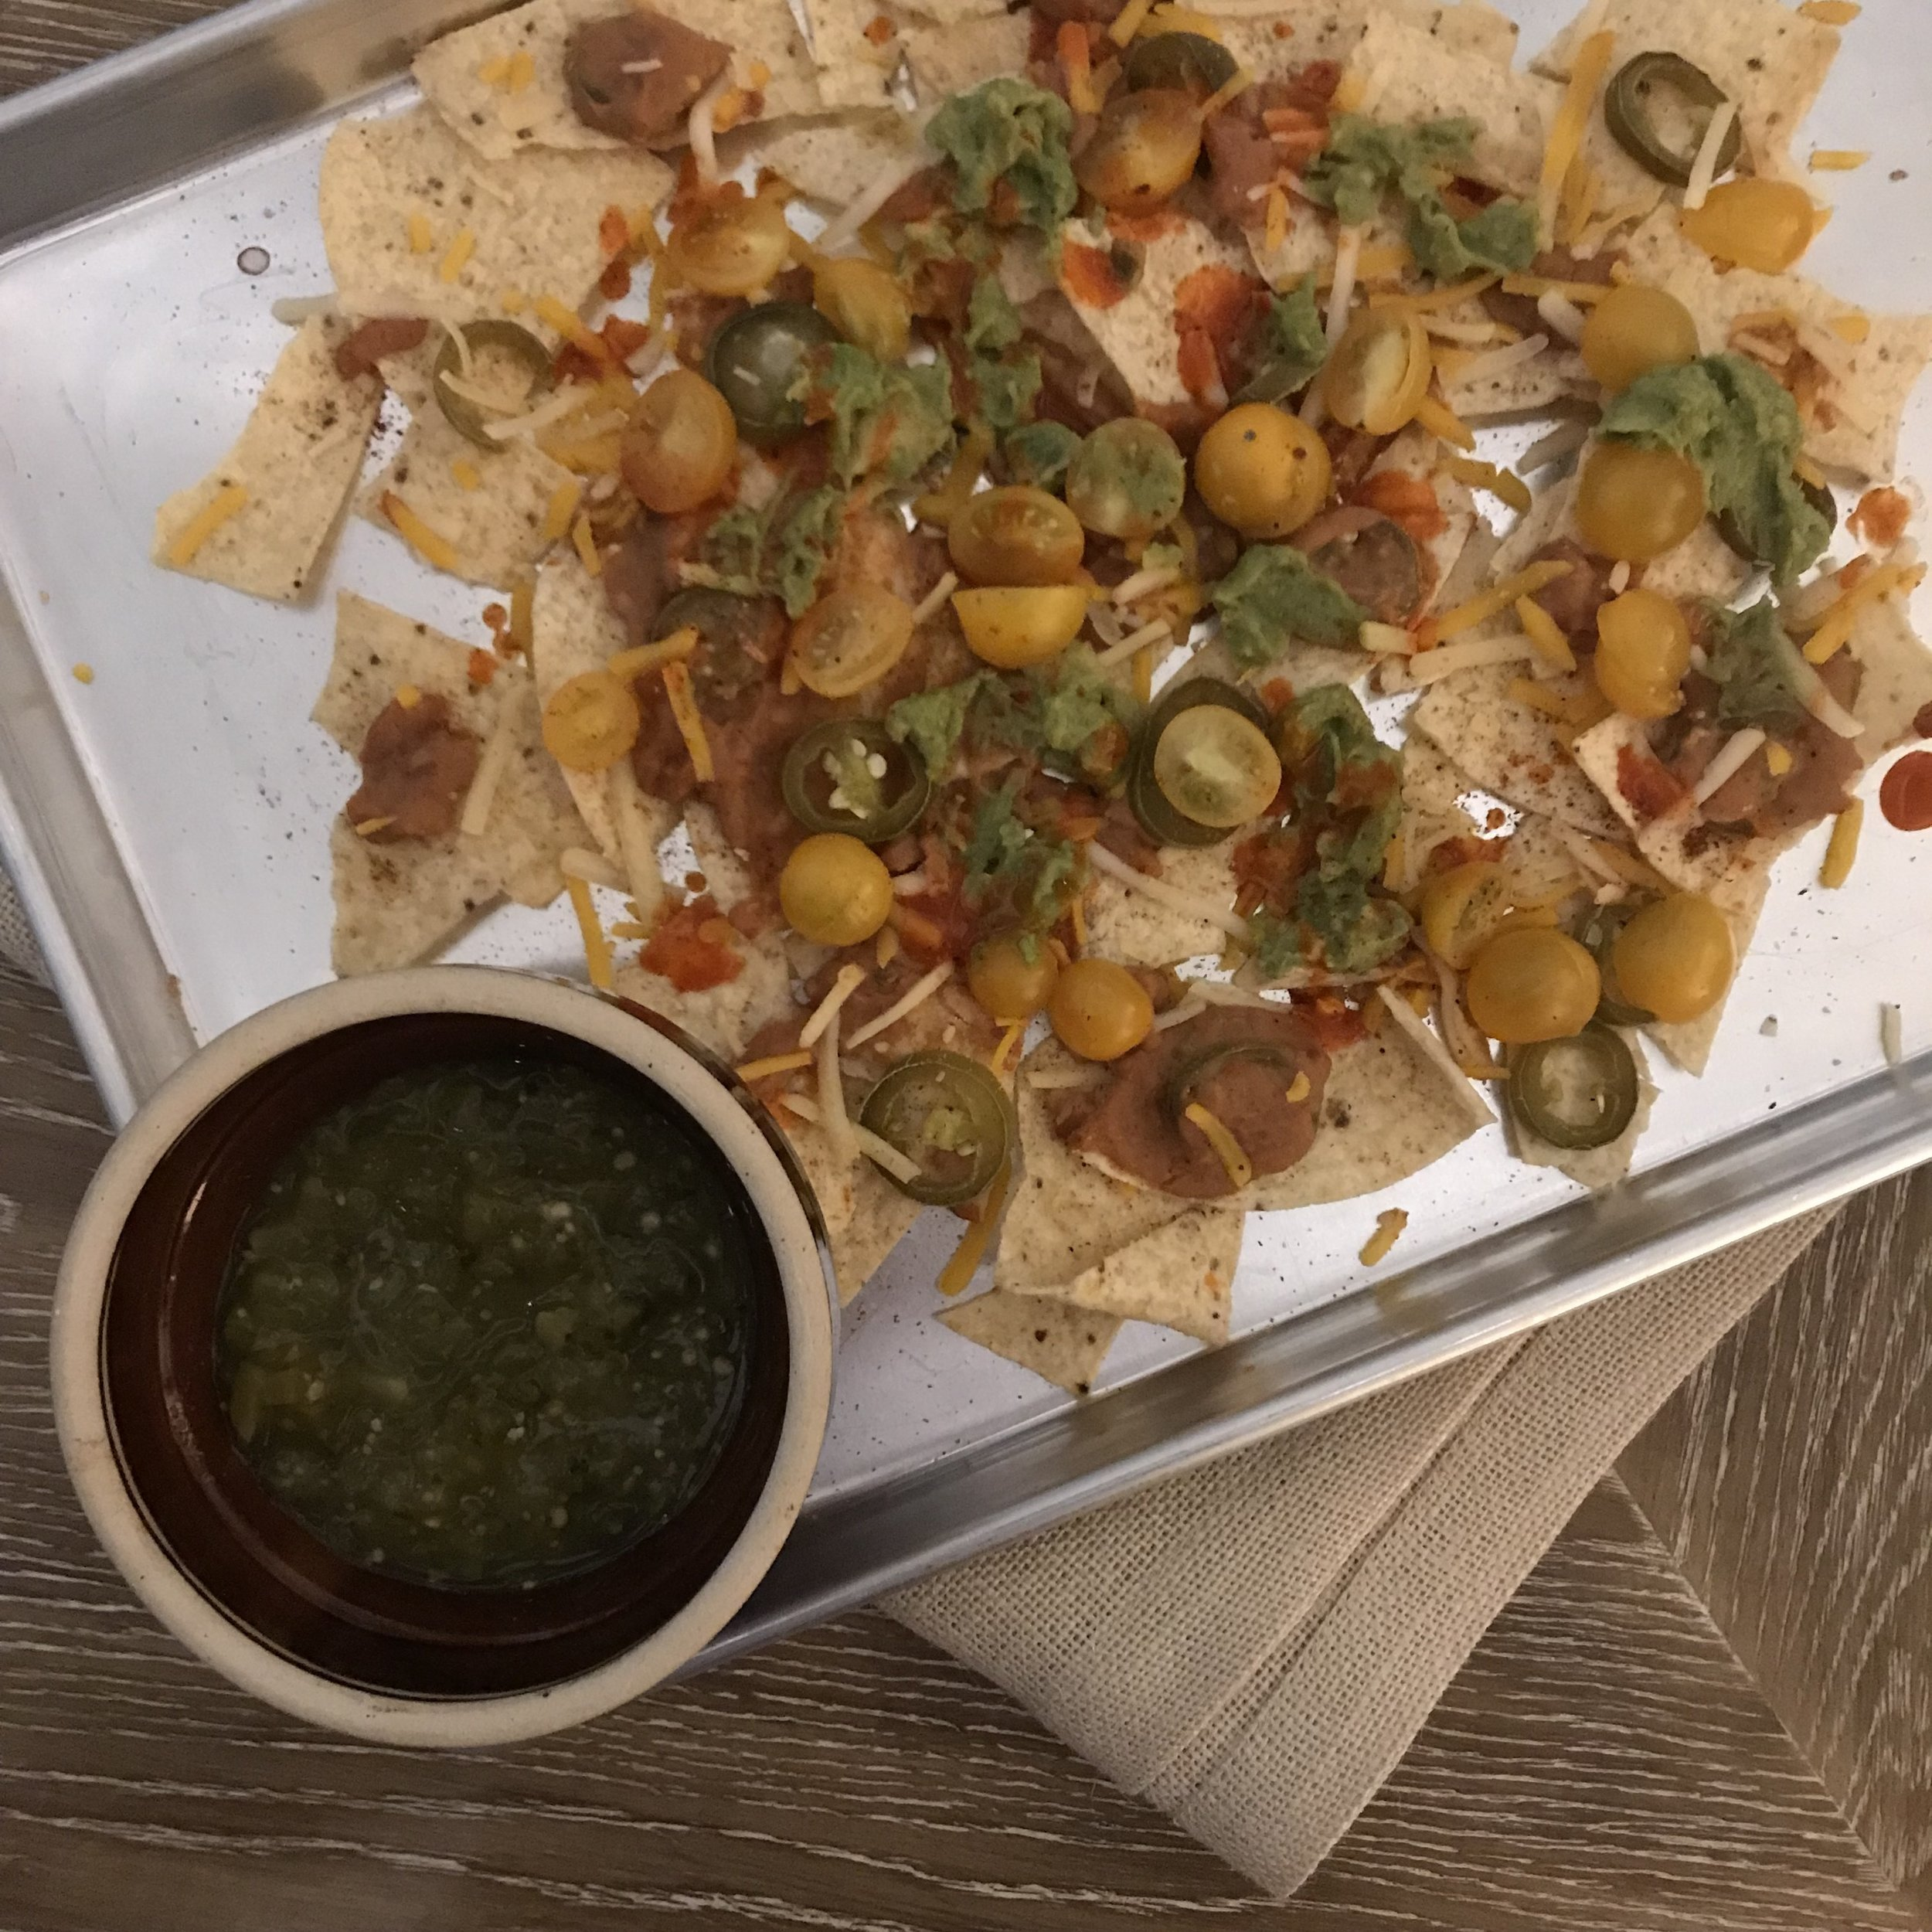 Vegan Nachos = YAS